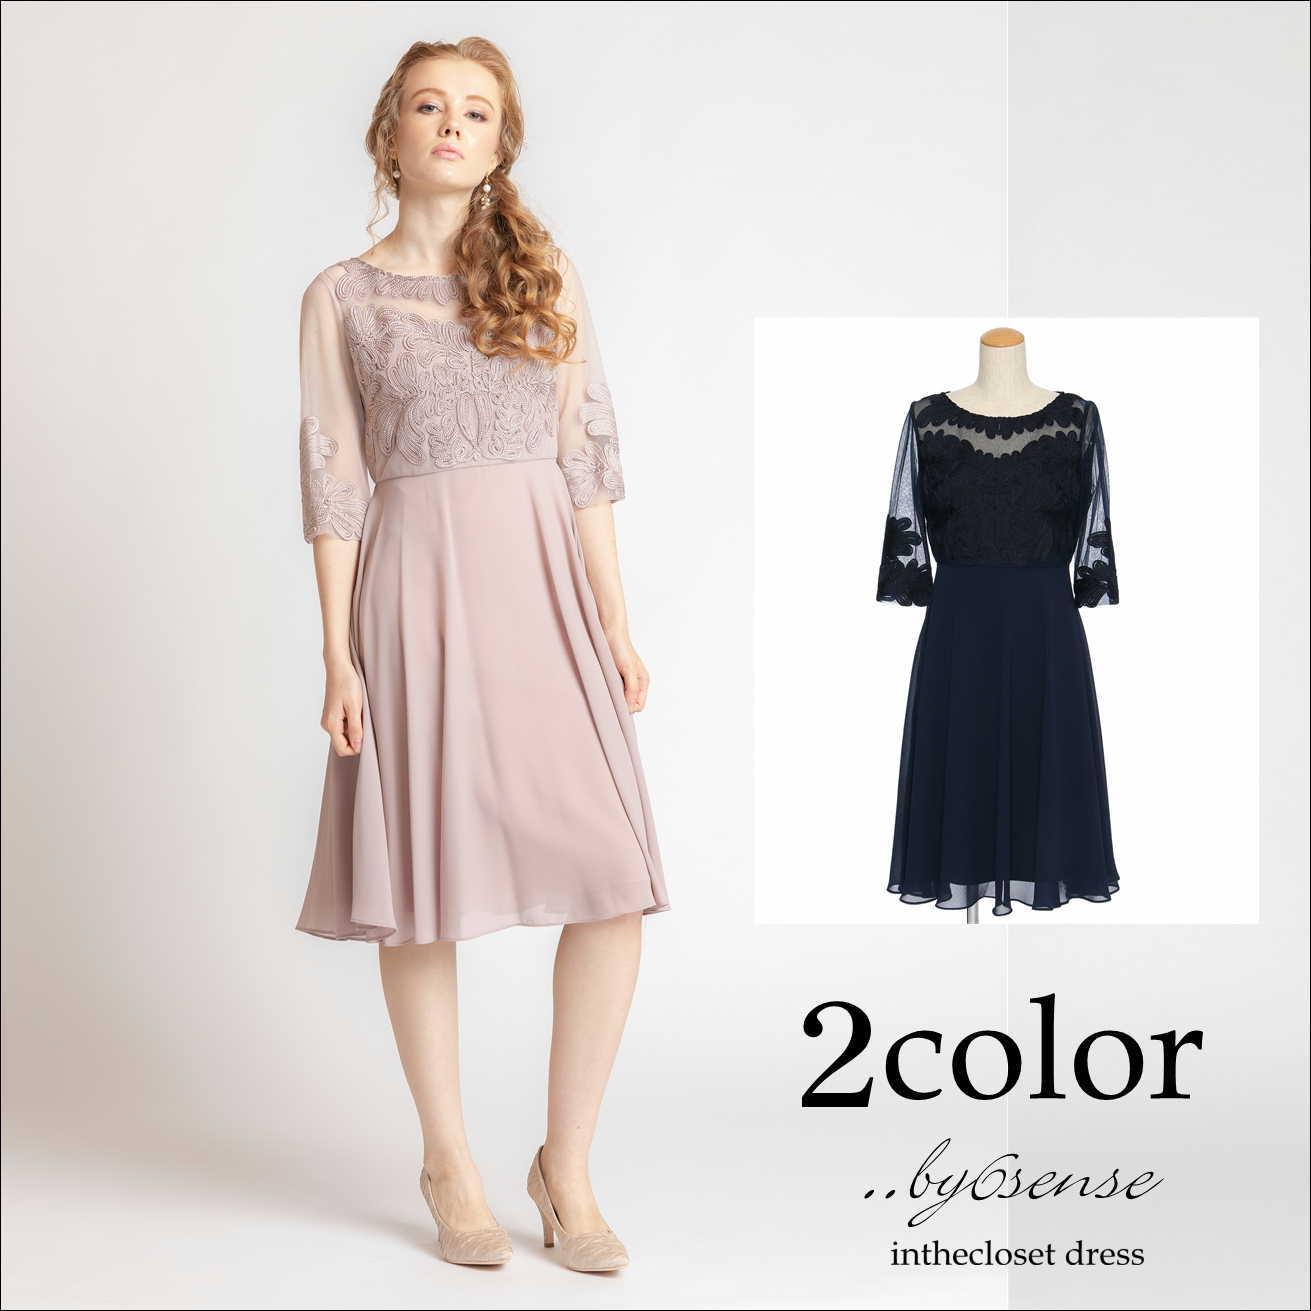 2color 袖付きコード刺繍レースミドル丈シフォンスカートワンピース  Dorry Doll(ドリードールドレス)